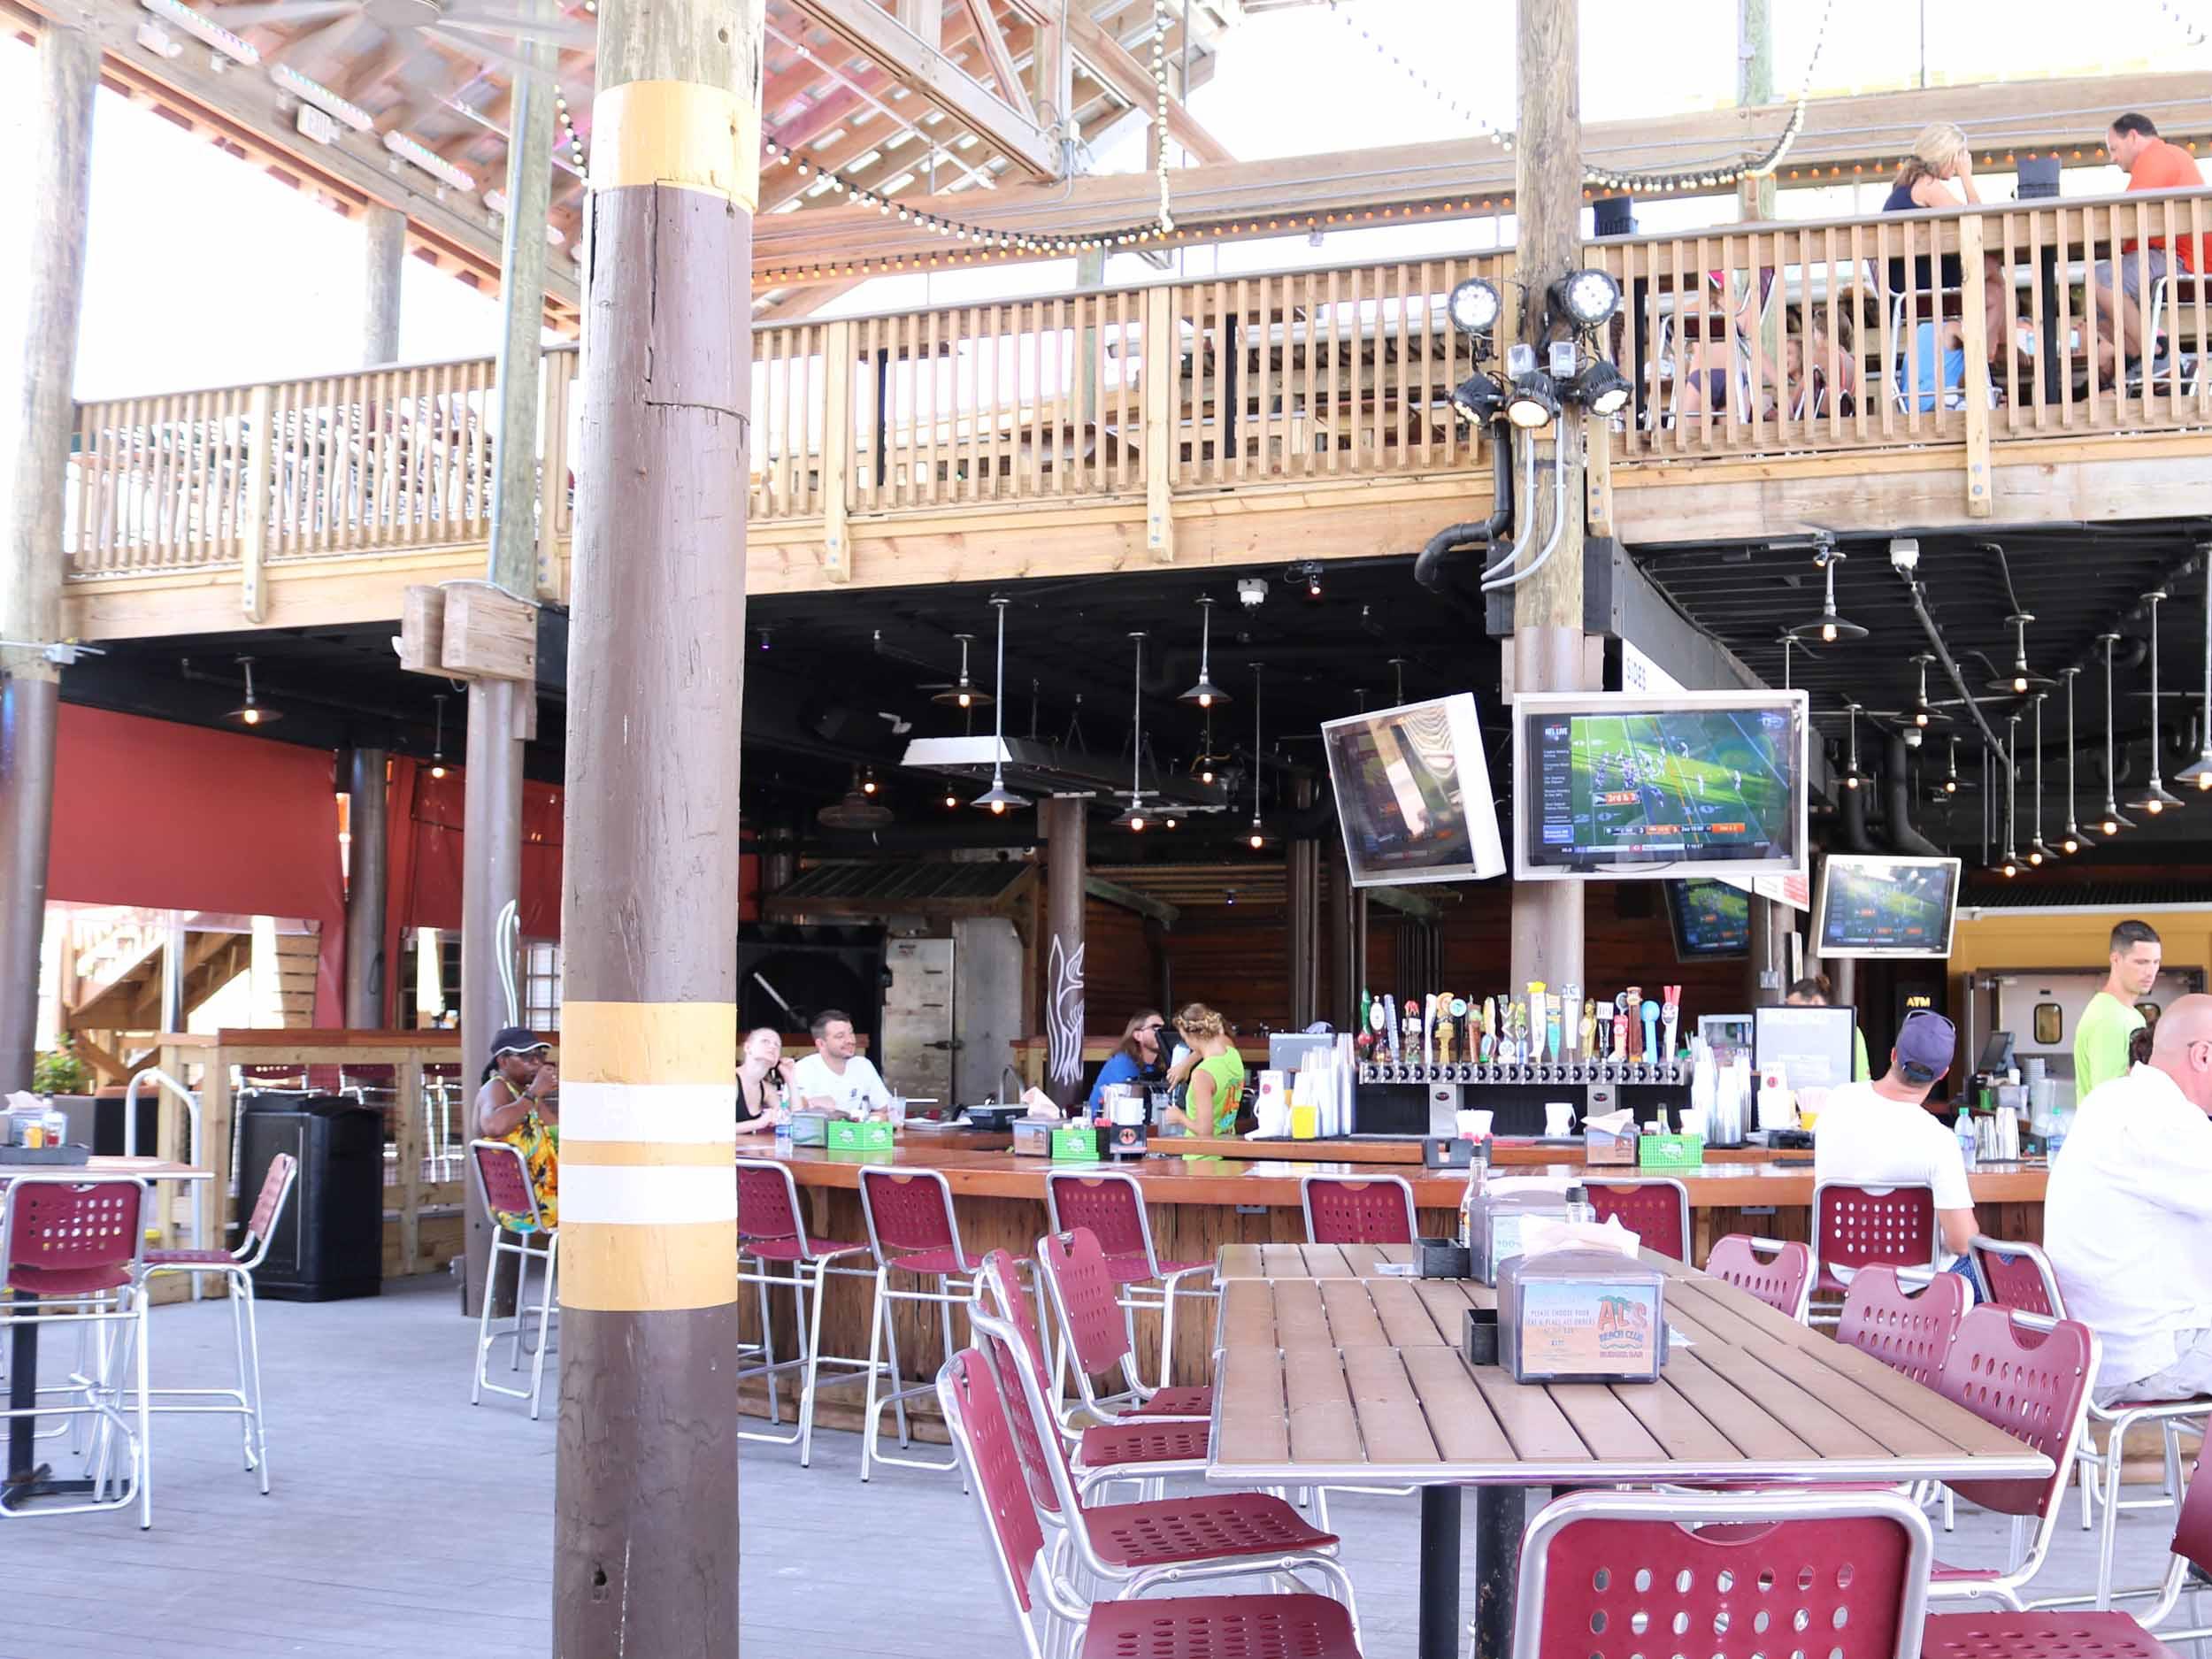 Al's Beach Club and Burger Bar Seating Area